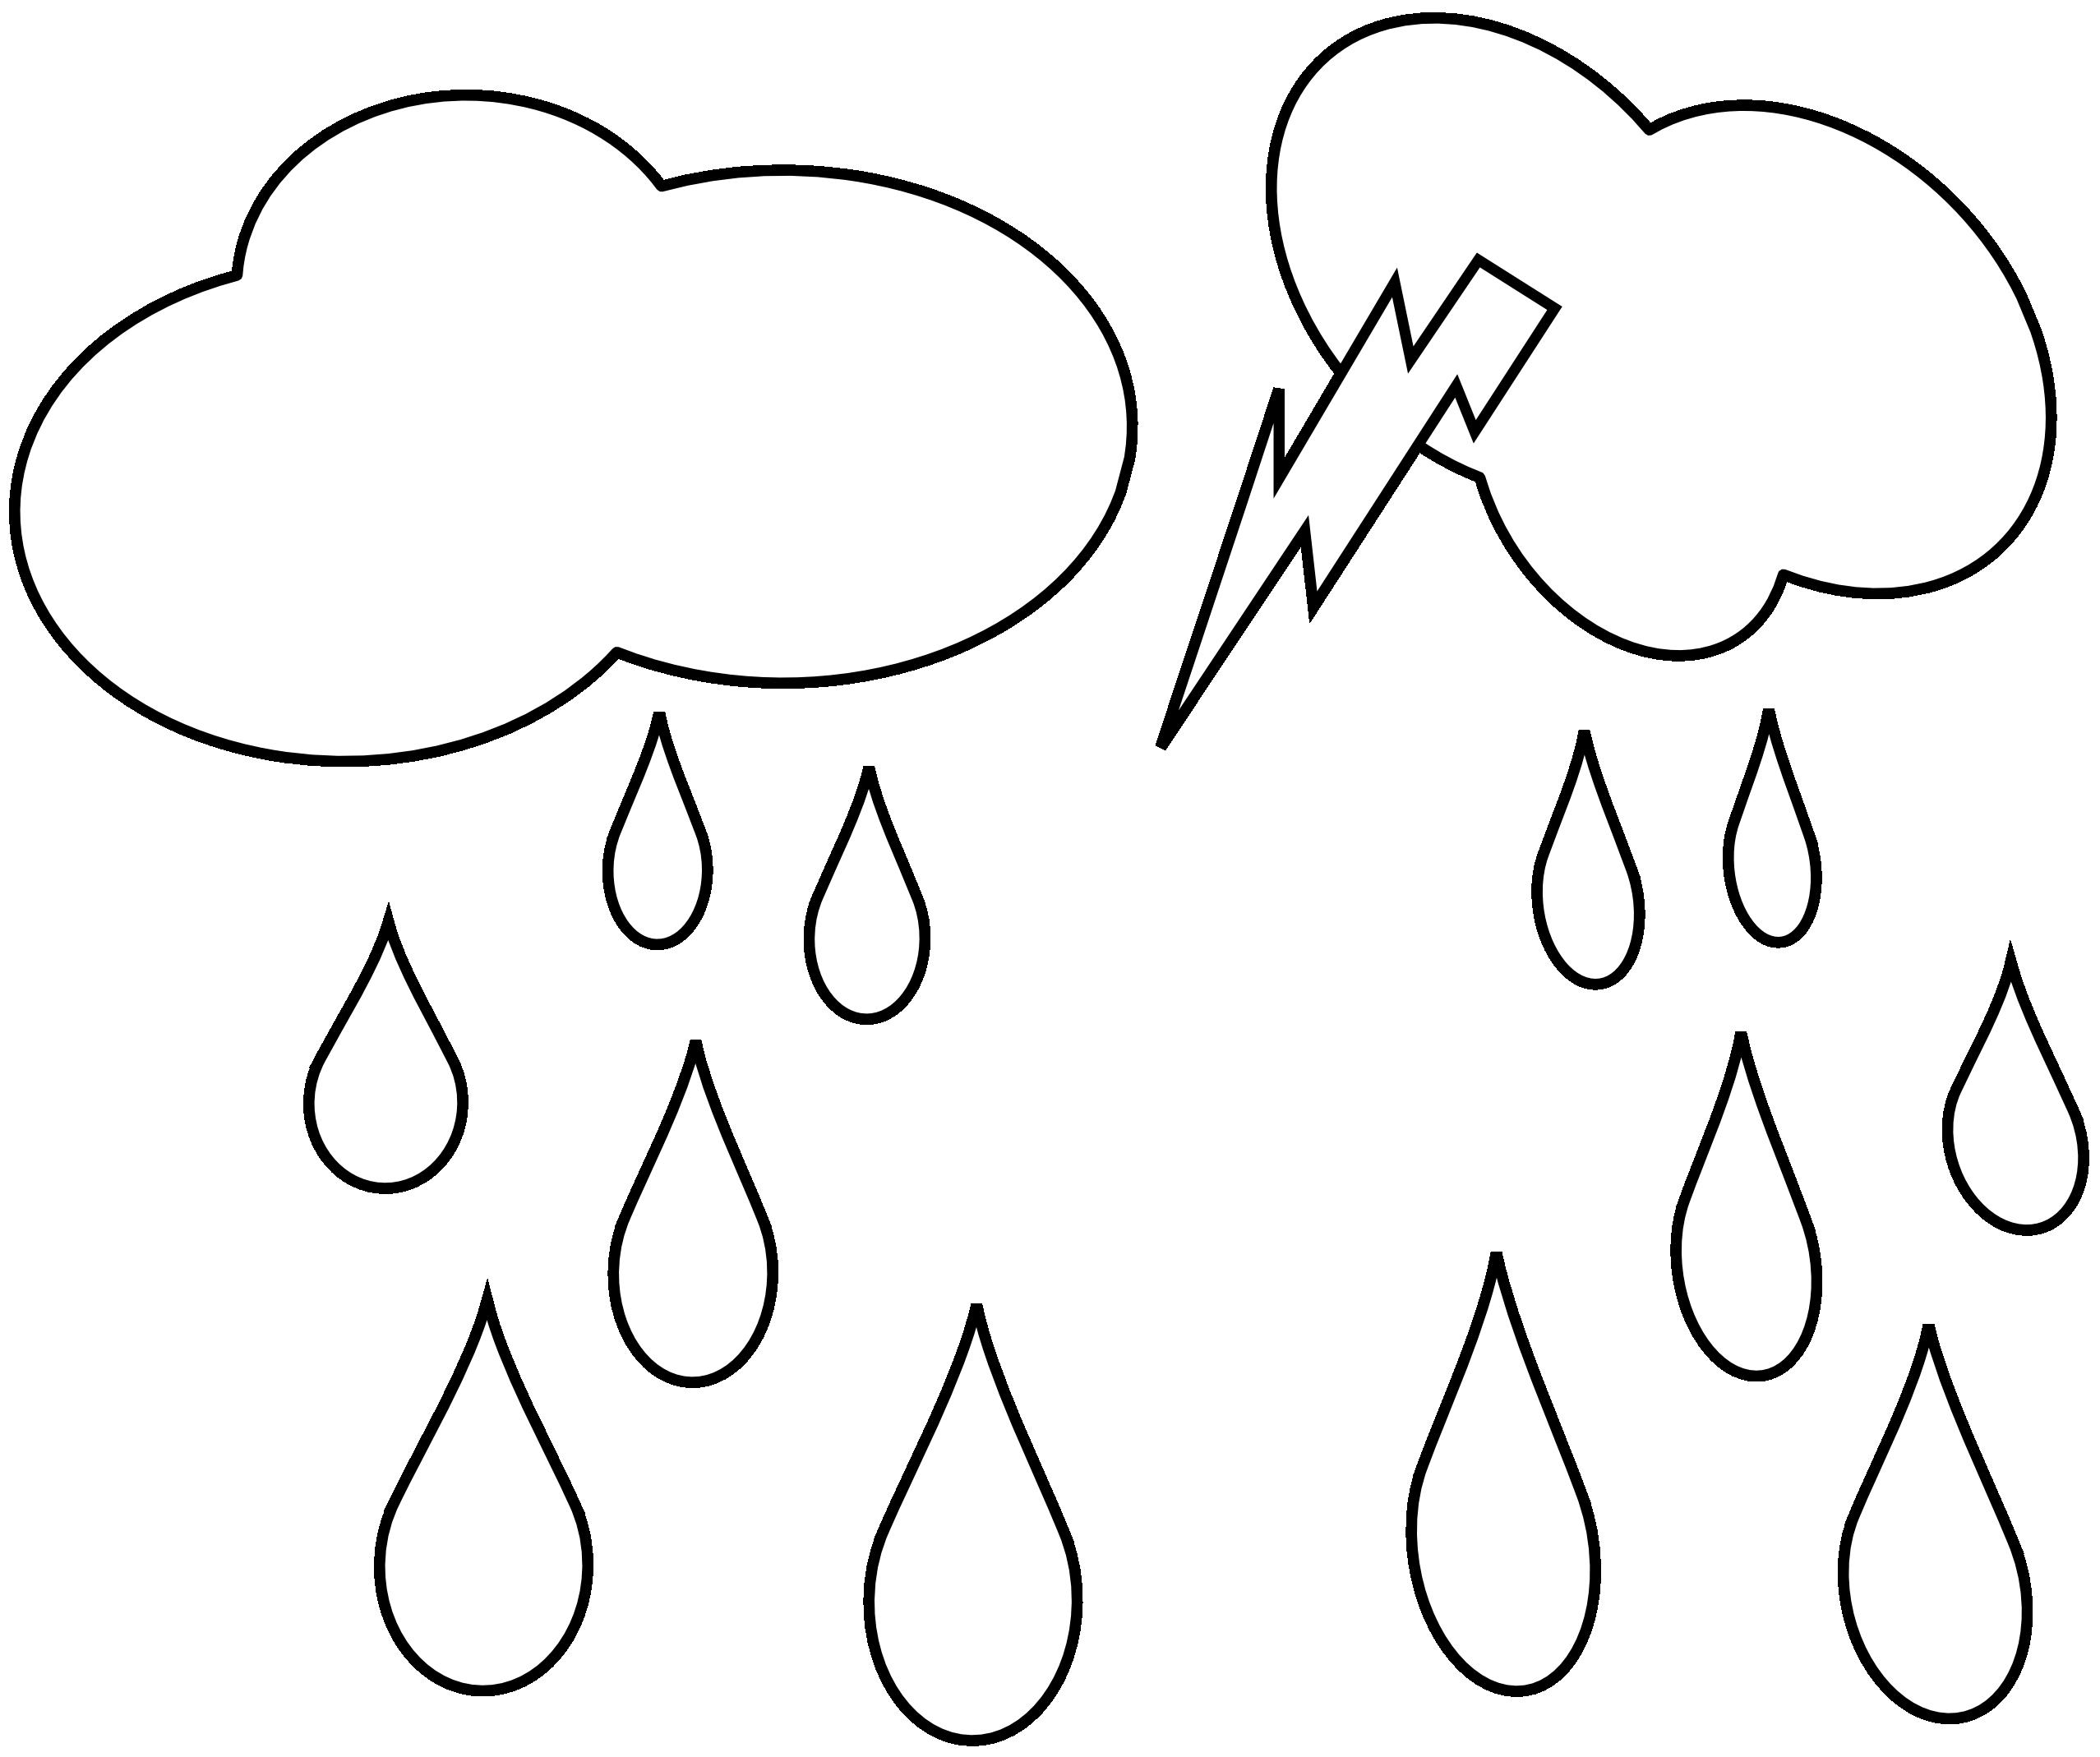 Sad rain cloud panda. Thunderstorm clipart black and white